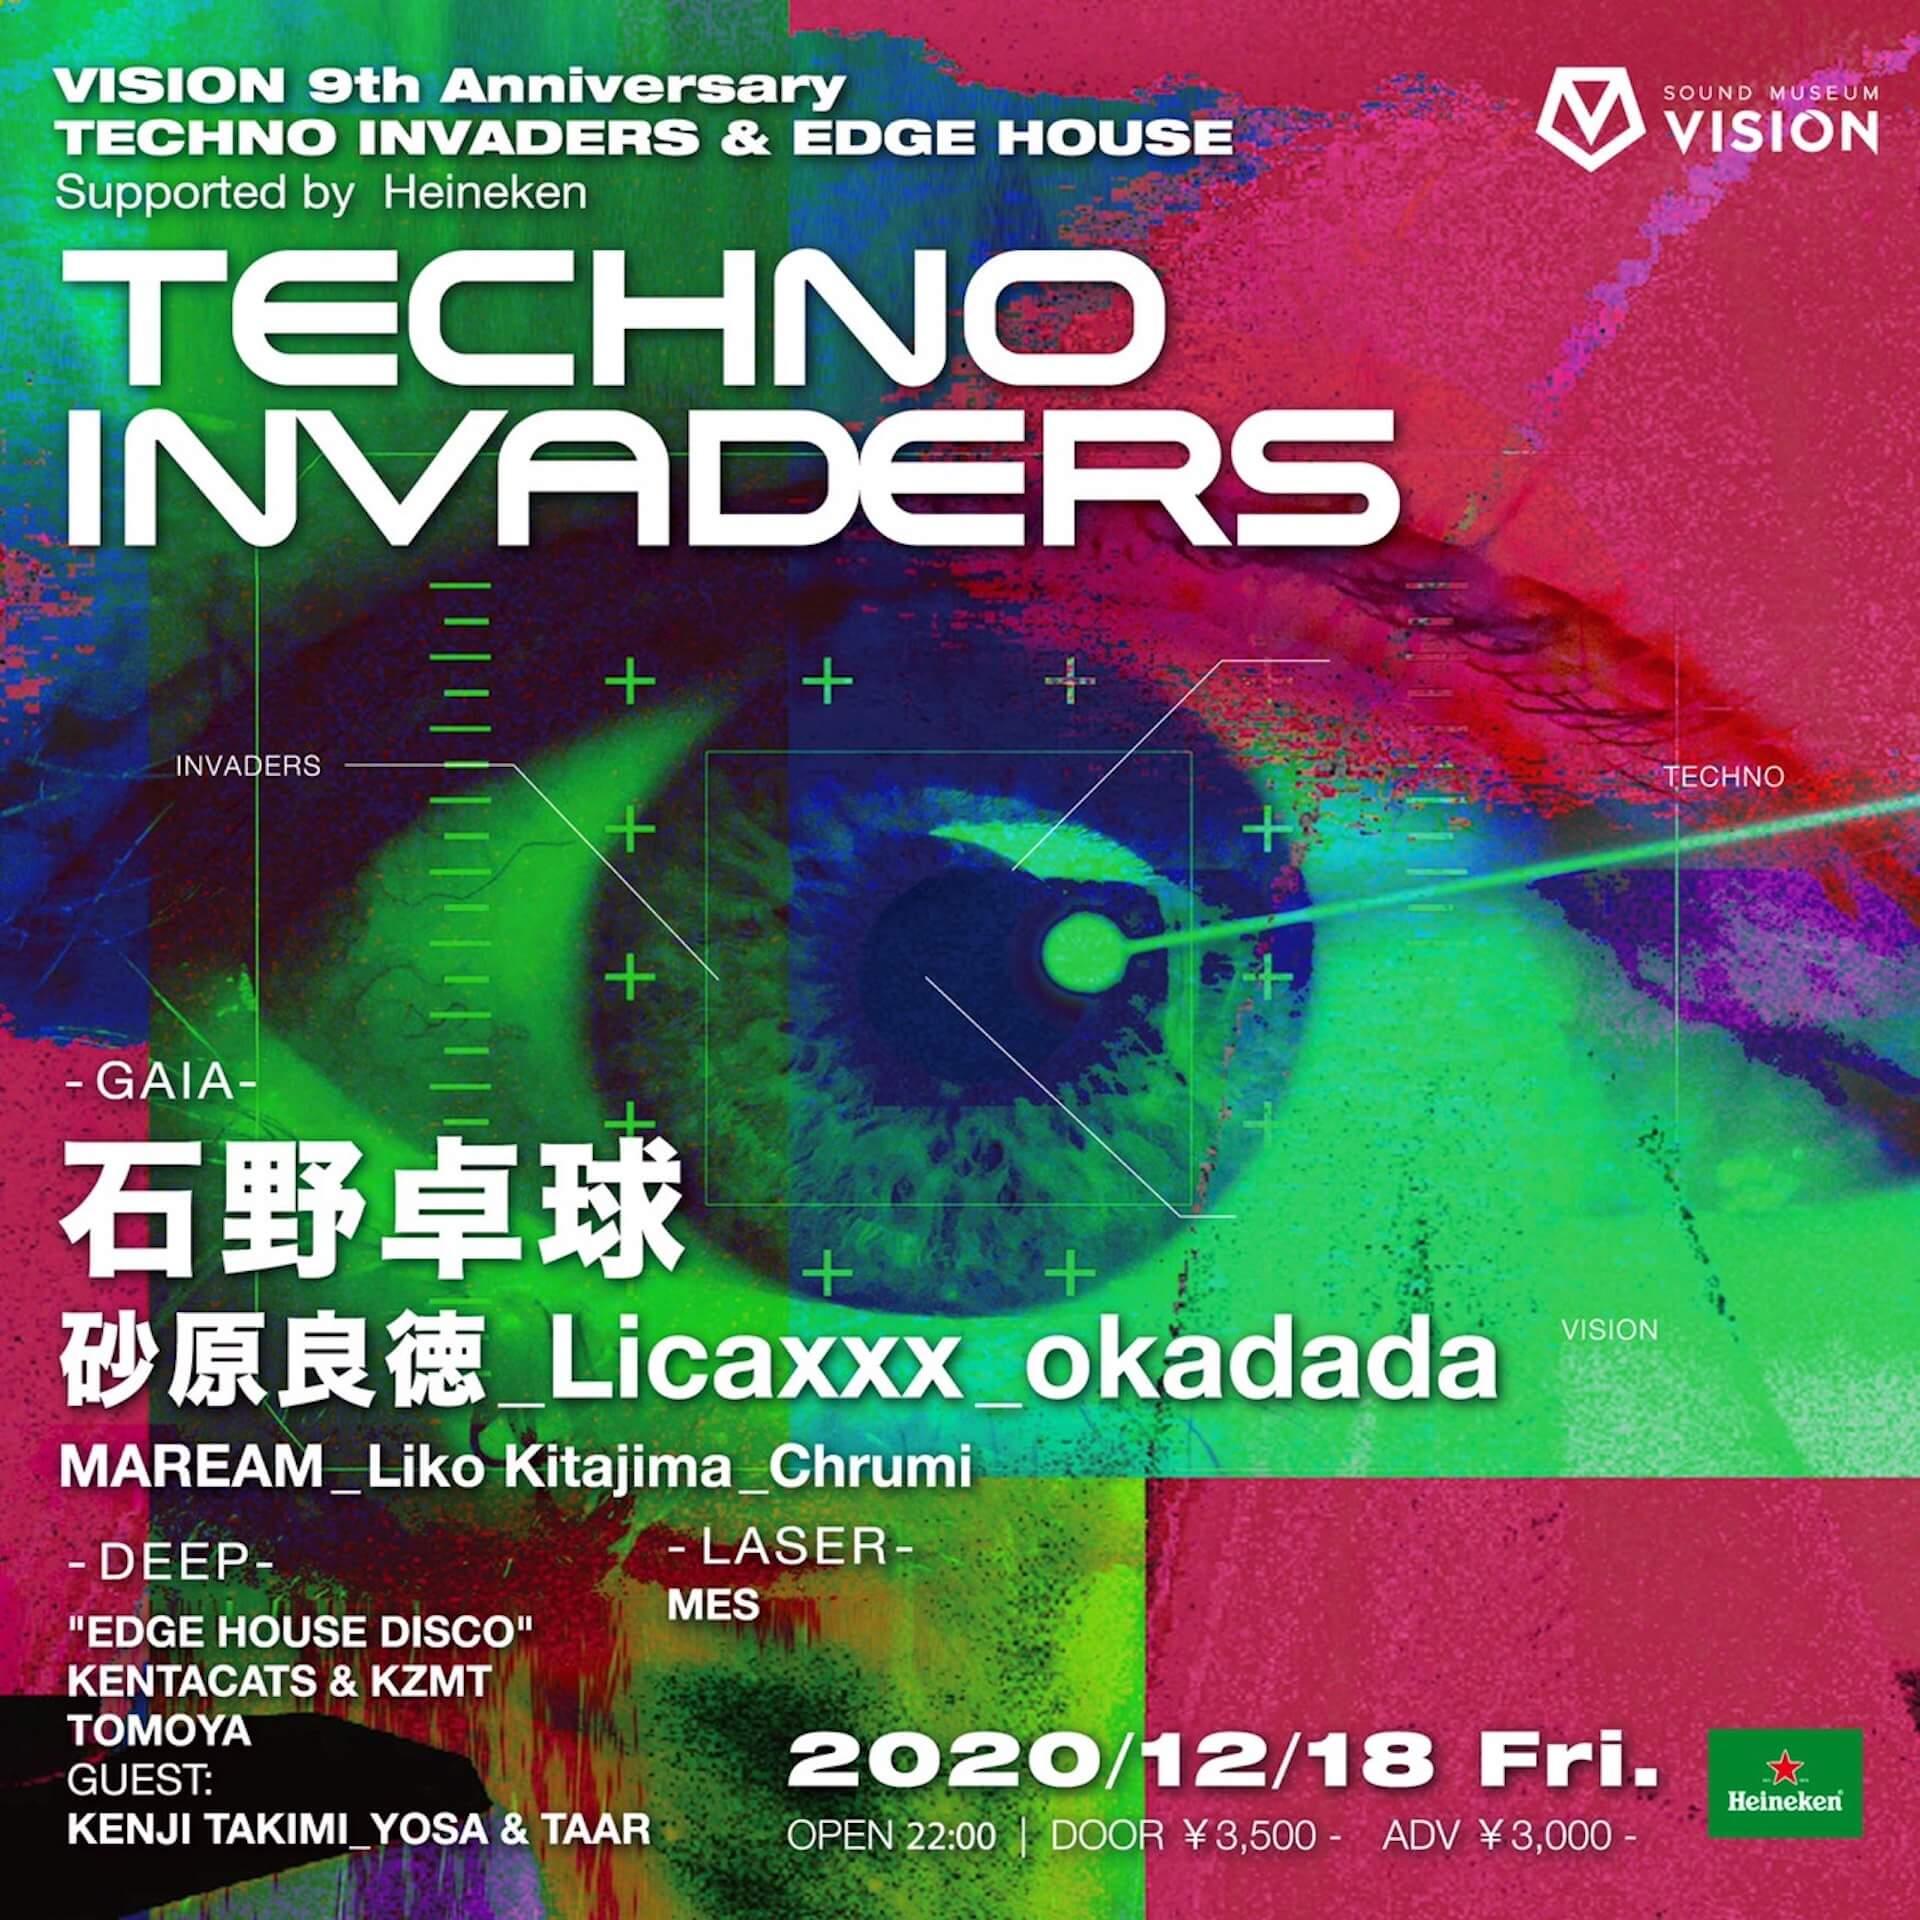 VISIONの9周年パーティー初日にTECHNO INVADERSとEDGE HOUSEのコラボが実現!石野卓球、砂原良徳、Licaxxx、okadadaらが出演 music201208_vision-main